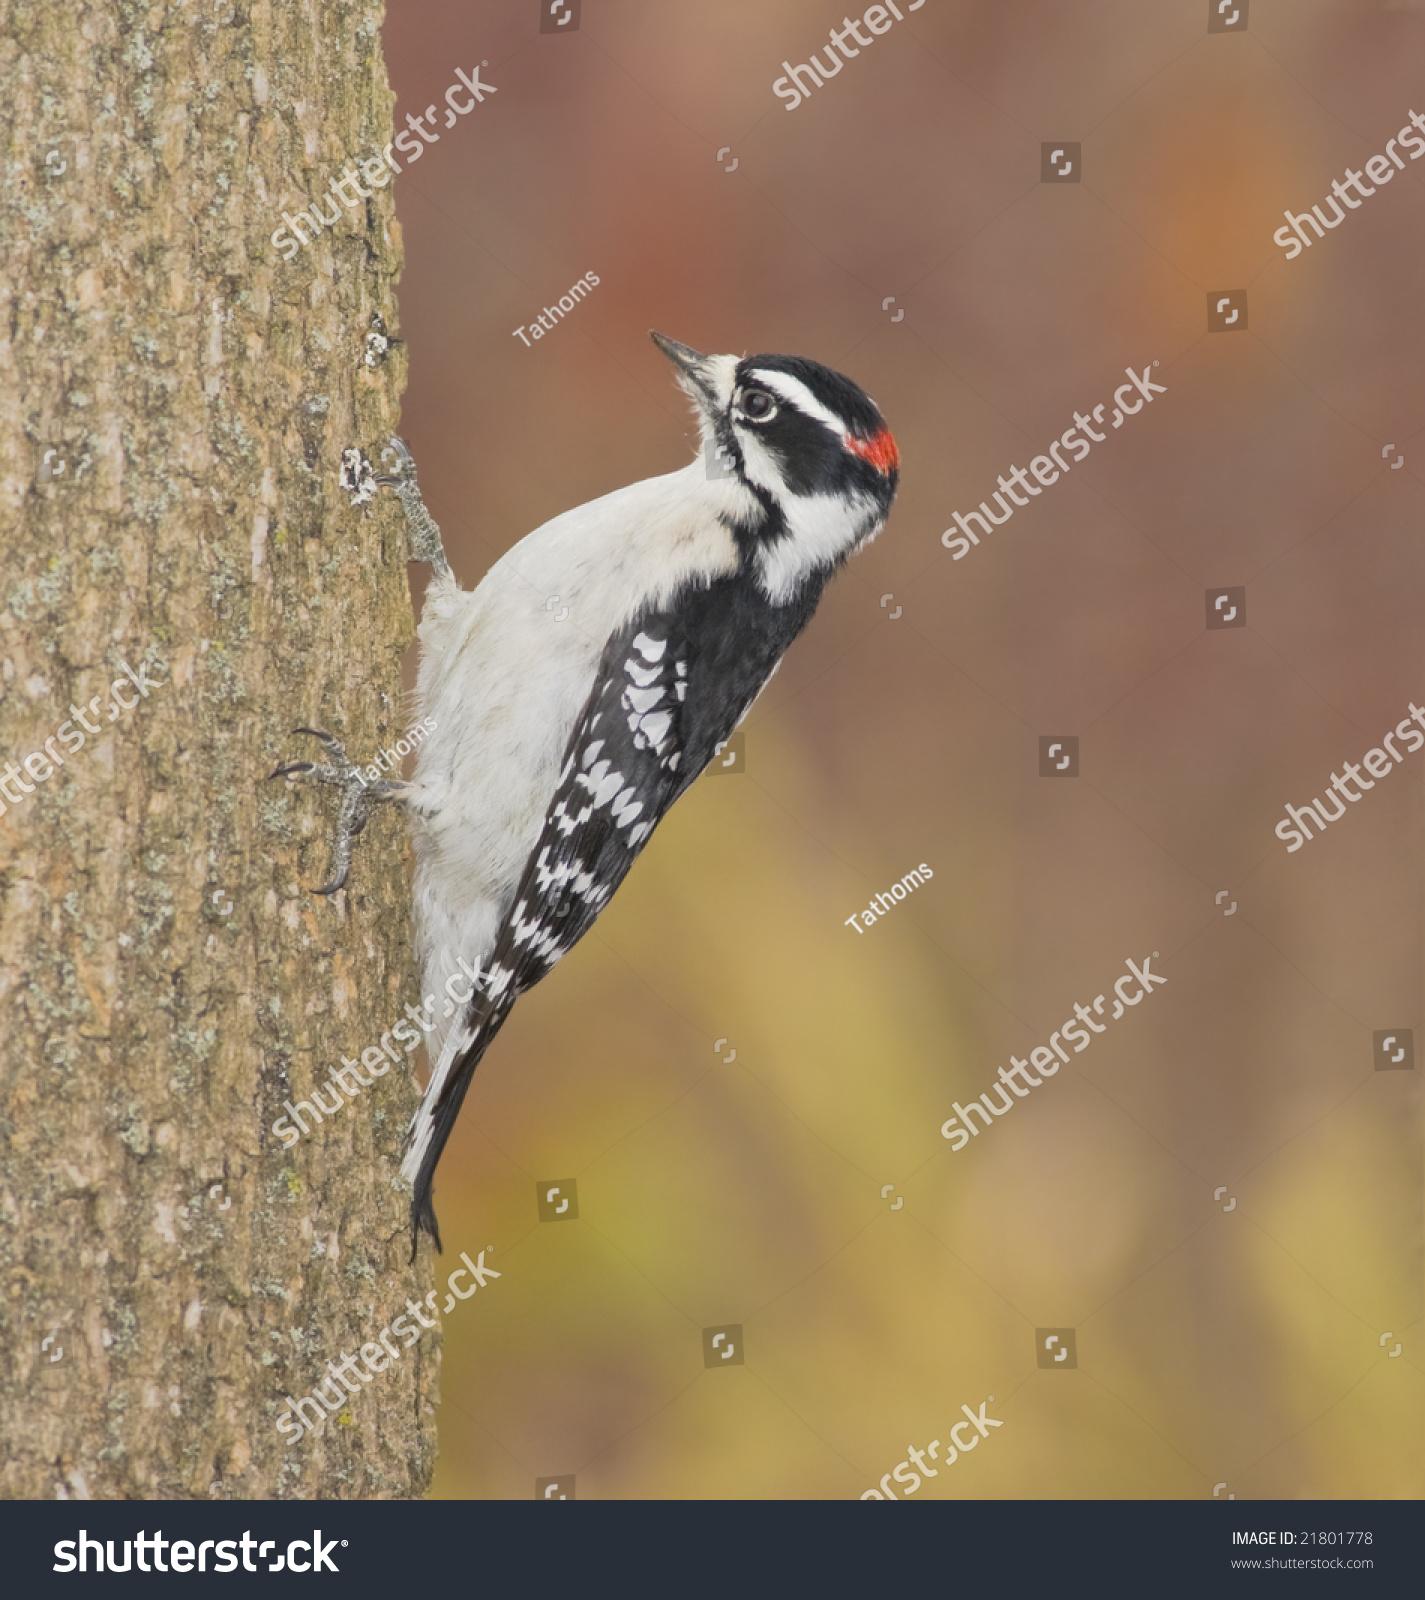 Downy woodpecker, male, Picoides pubescens. Copy space.